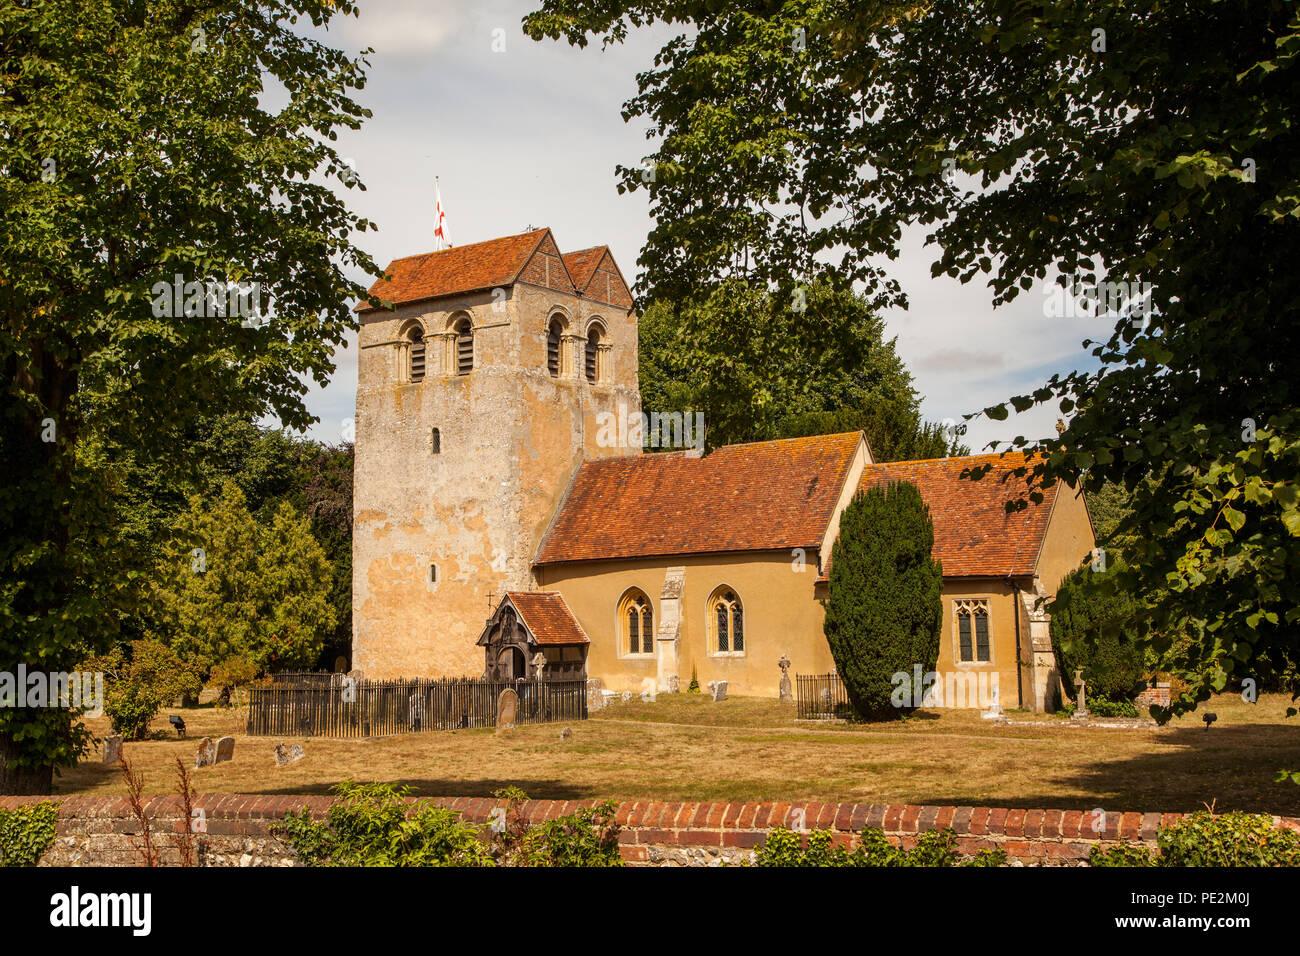 St Bartholomew Church in the chilterns village of Fingest Buckinghamshire England UK setting for many Midsomer Murders - Stock Image